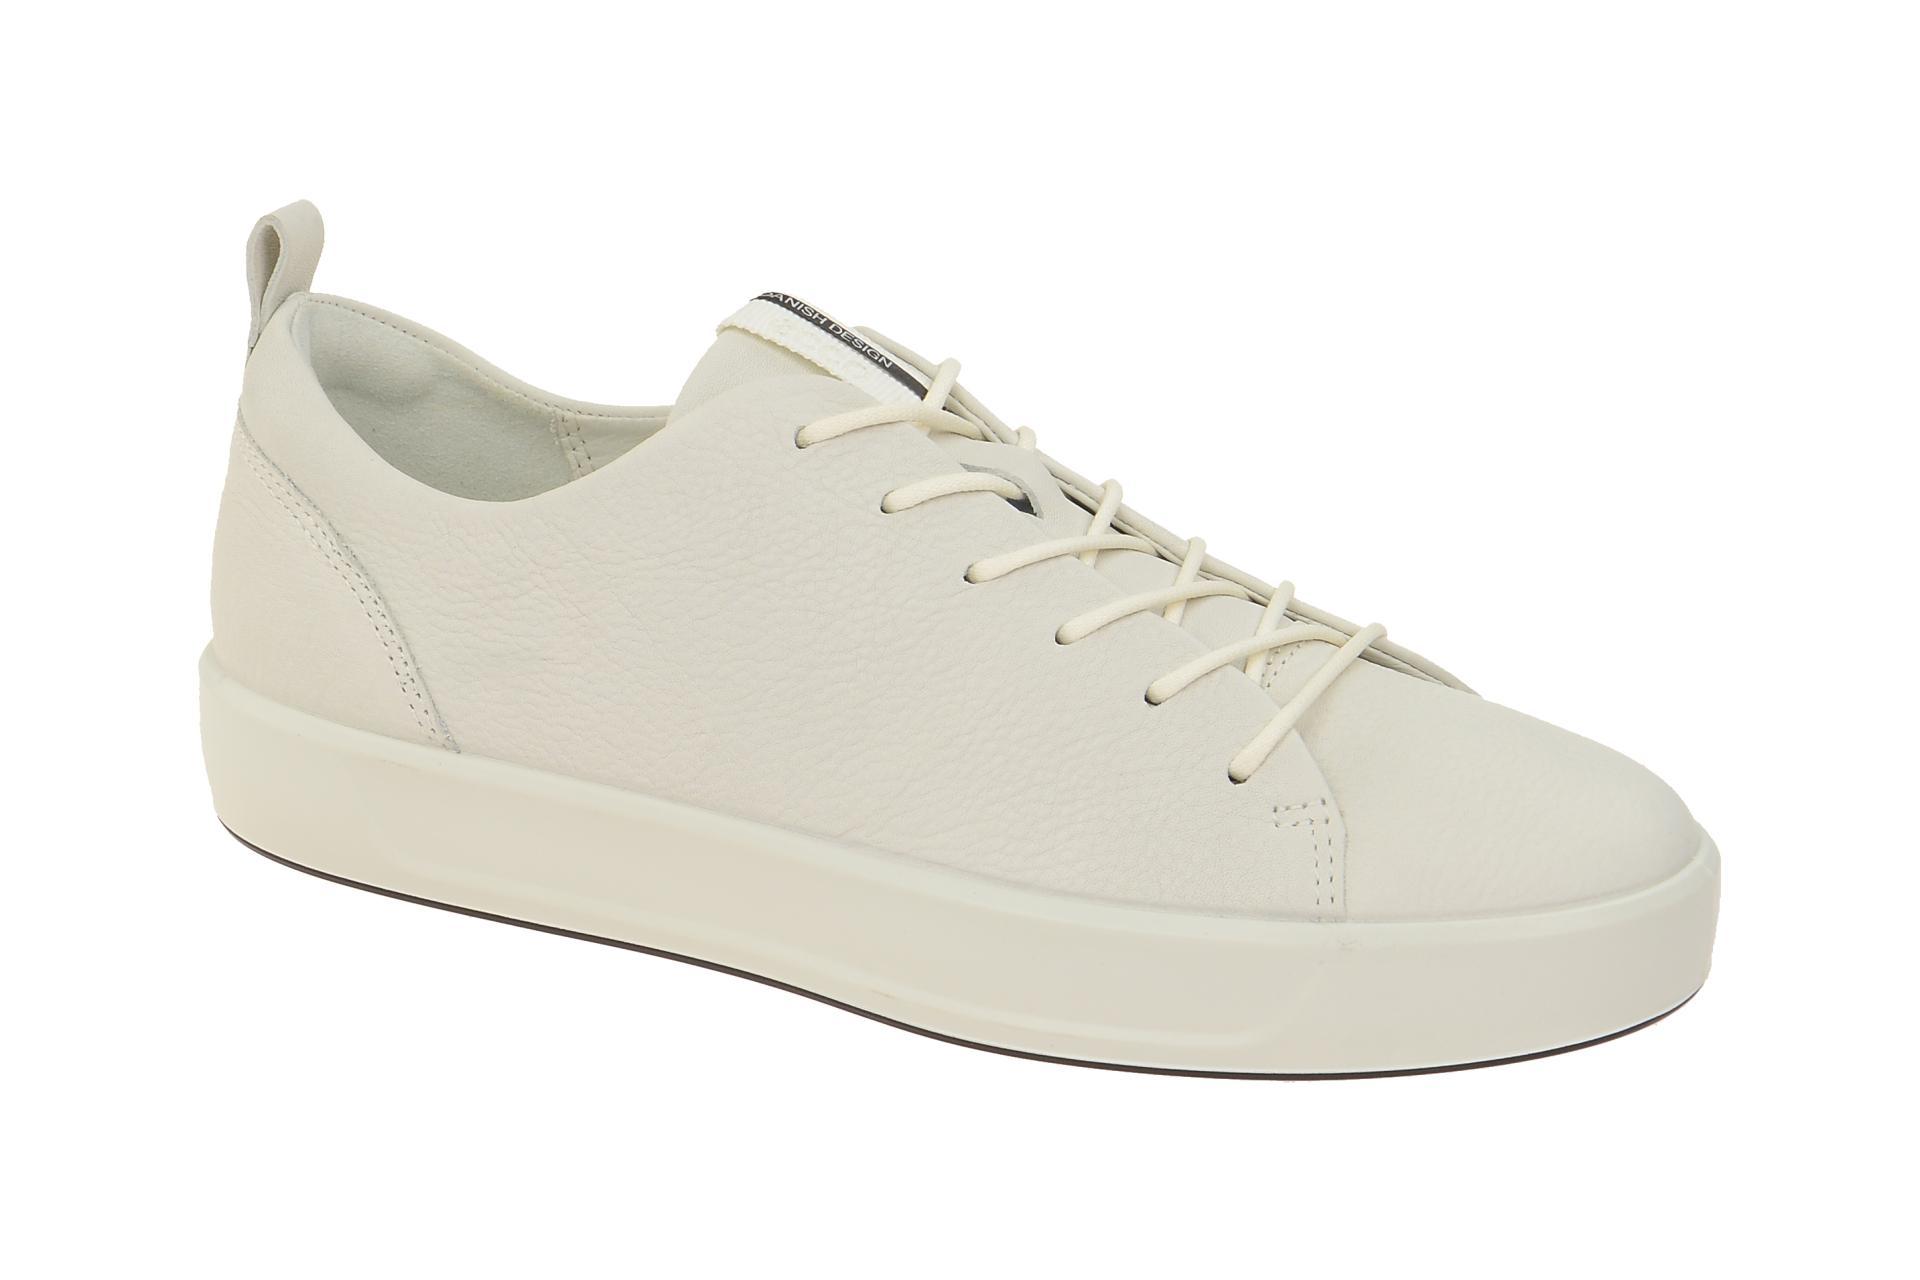 cb63a5dd8d4436 Ecco Sneaker Schuhe Soft 8 Ladies weiß - Schuhhaus Strauch Shop